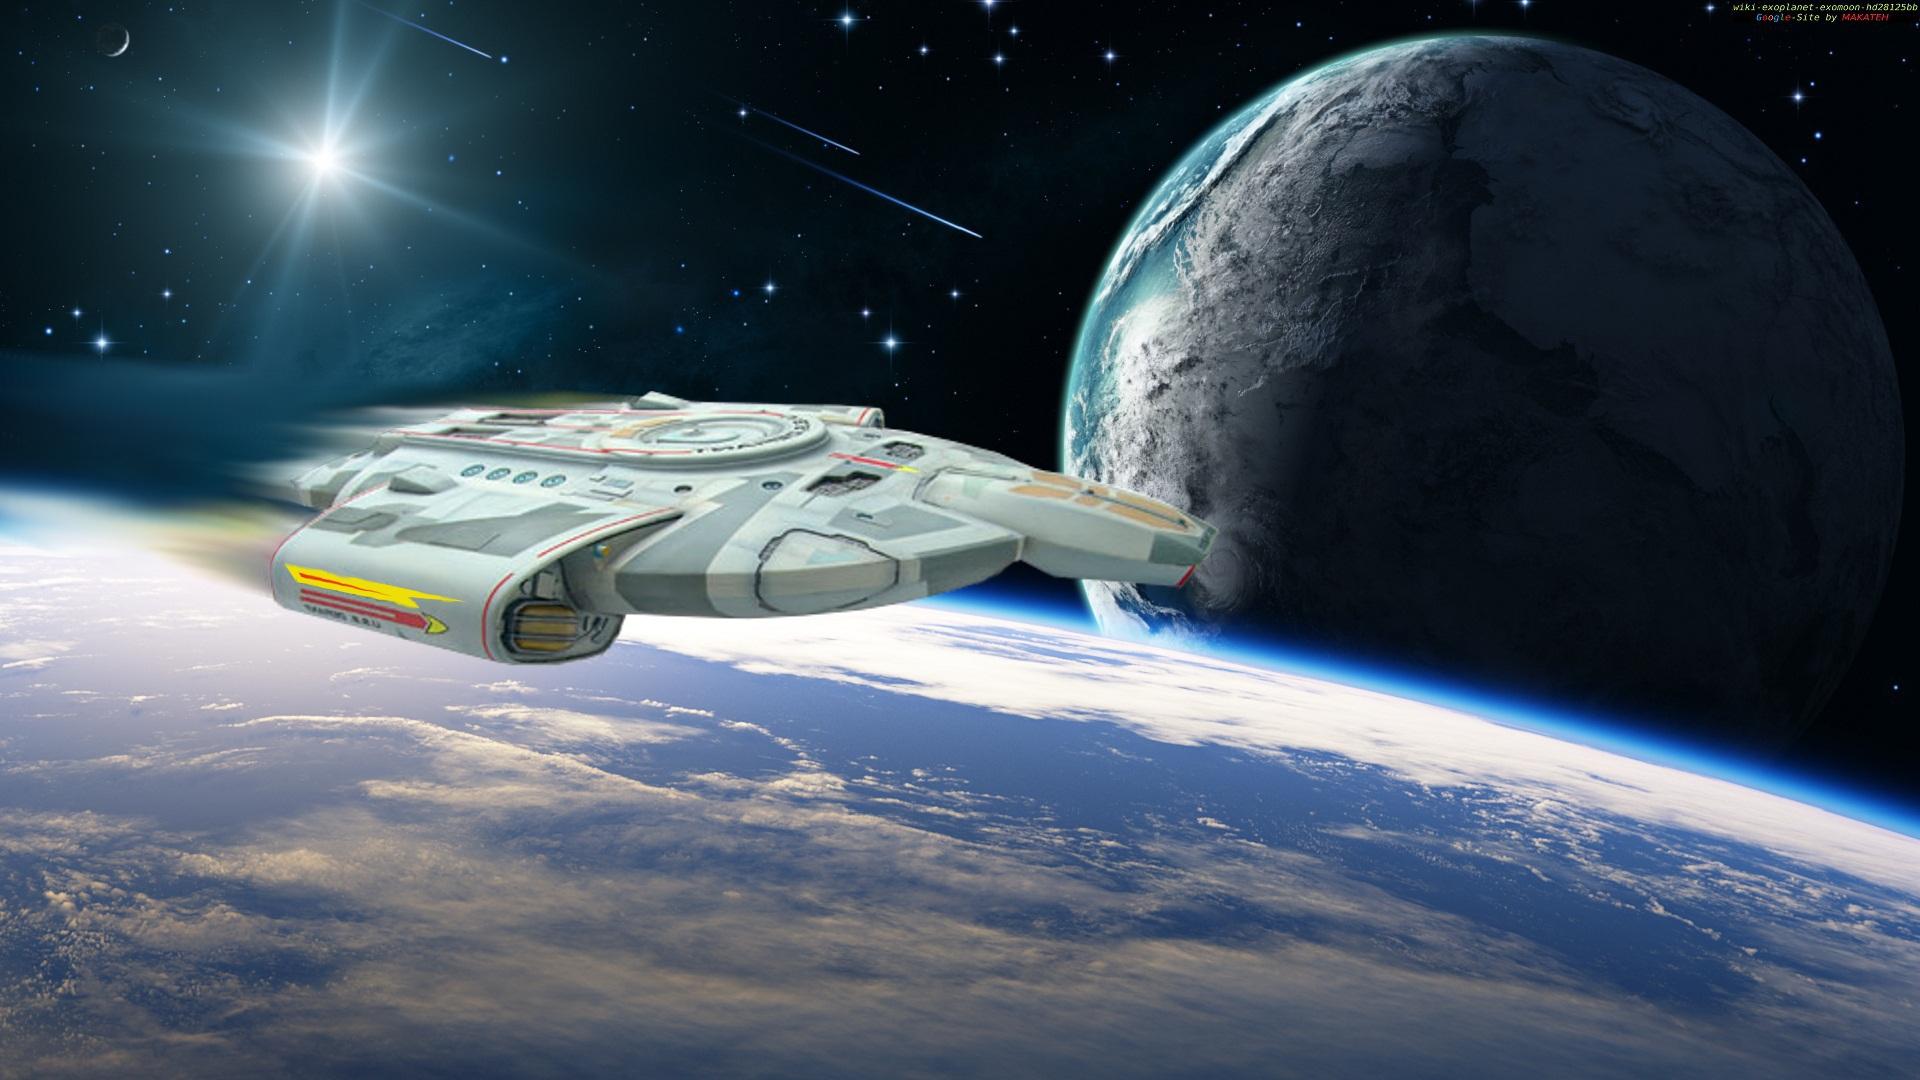 Star Trek Wallpaper - Hd Space Wallpaper For Pc , HD Wallpaper & Backgrounds